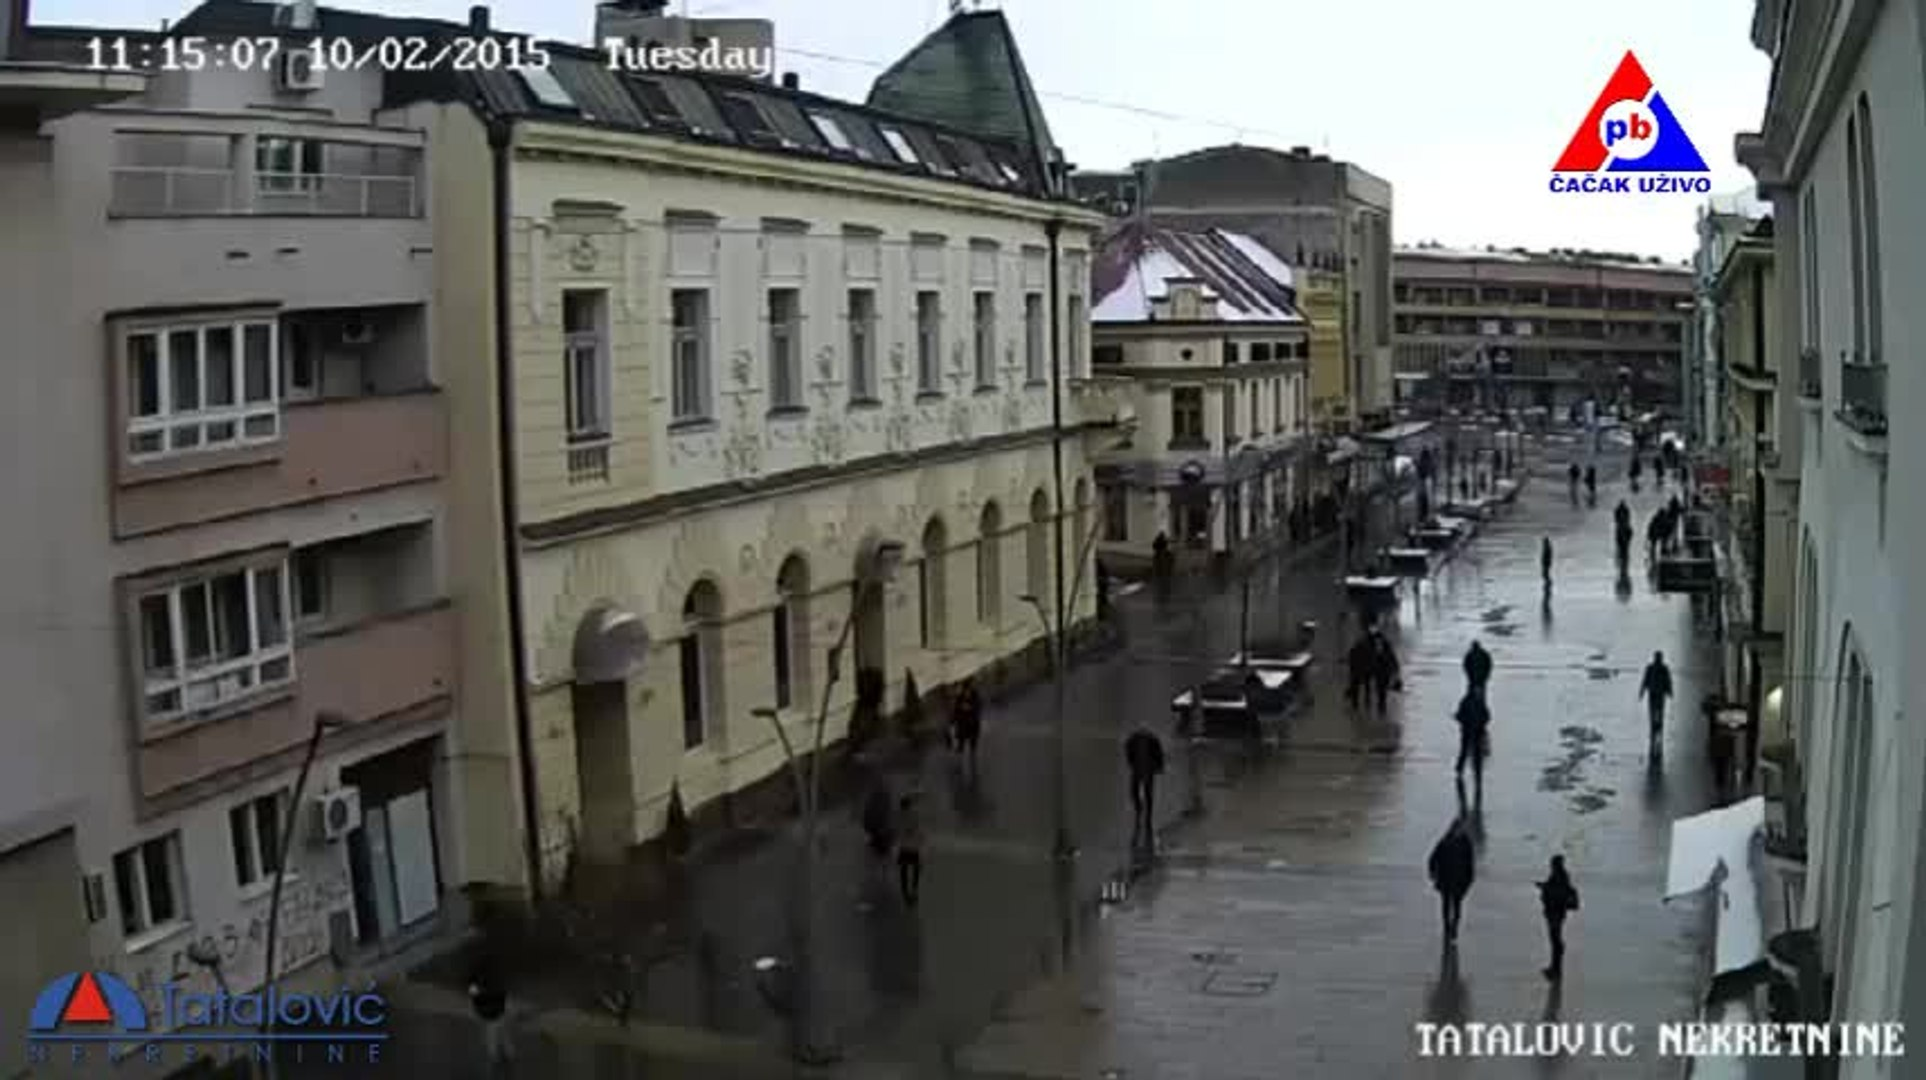 Čačak kamera 1 - www.cacakuzivo.rs